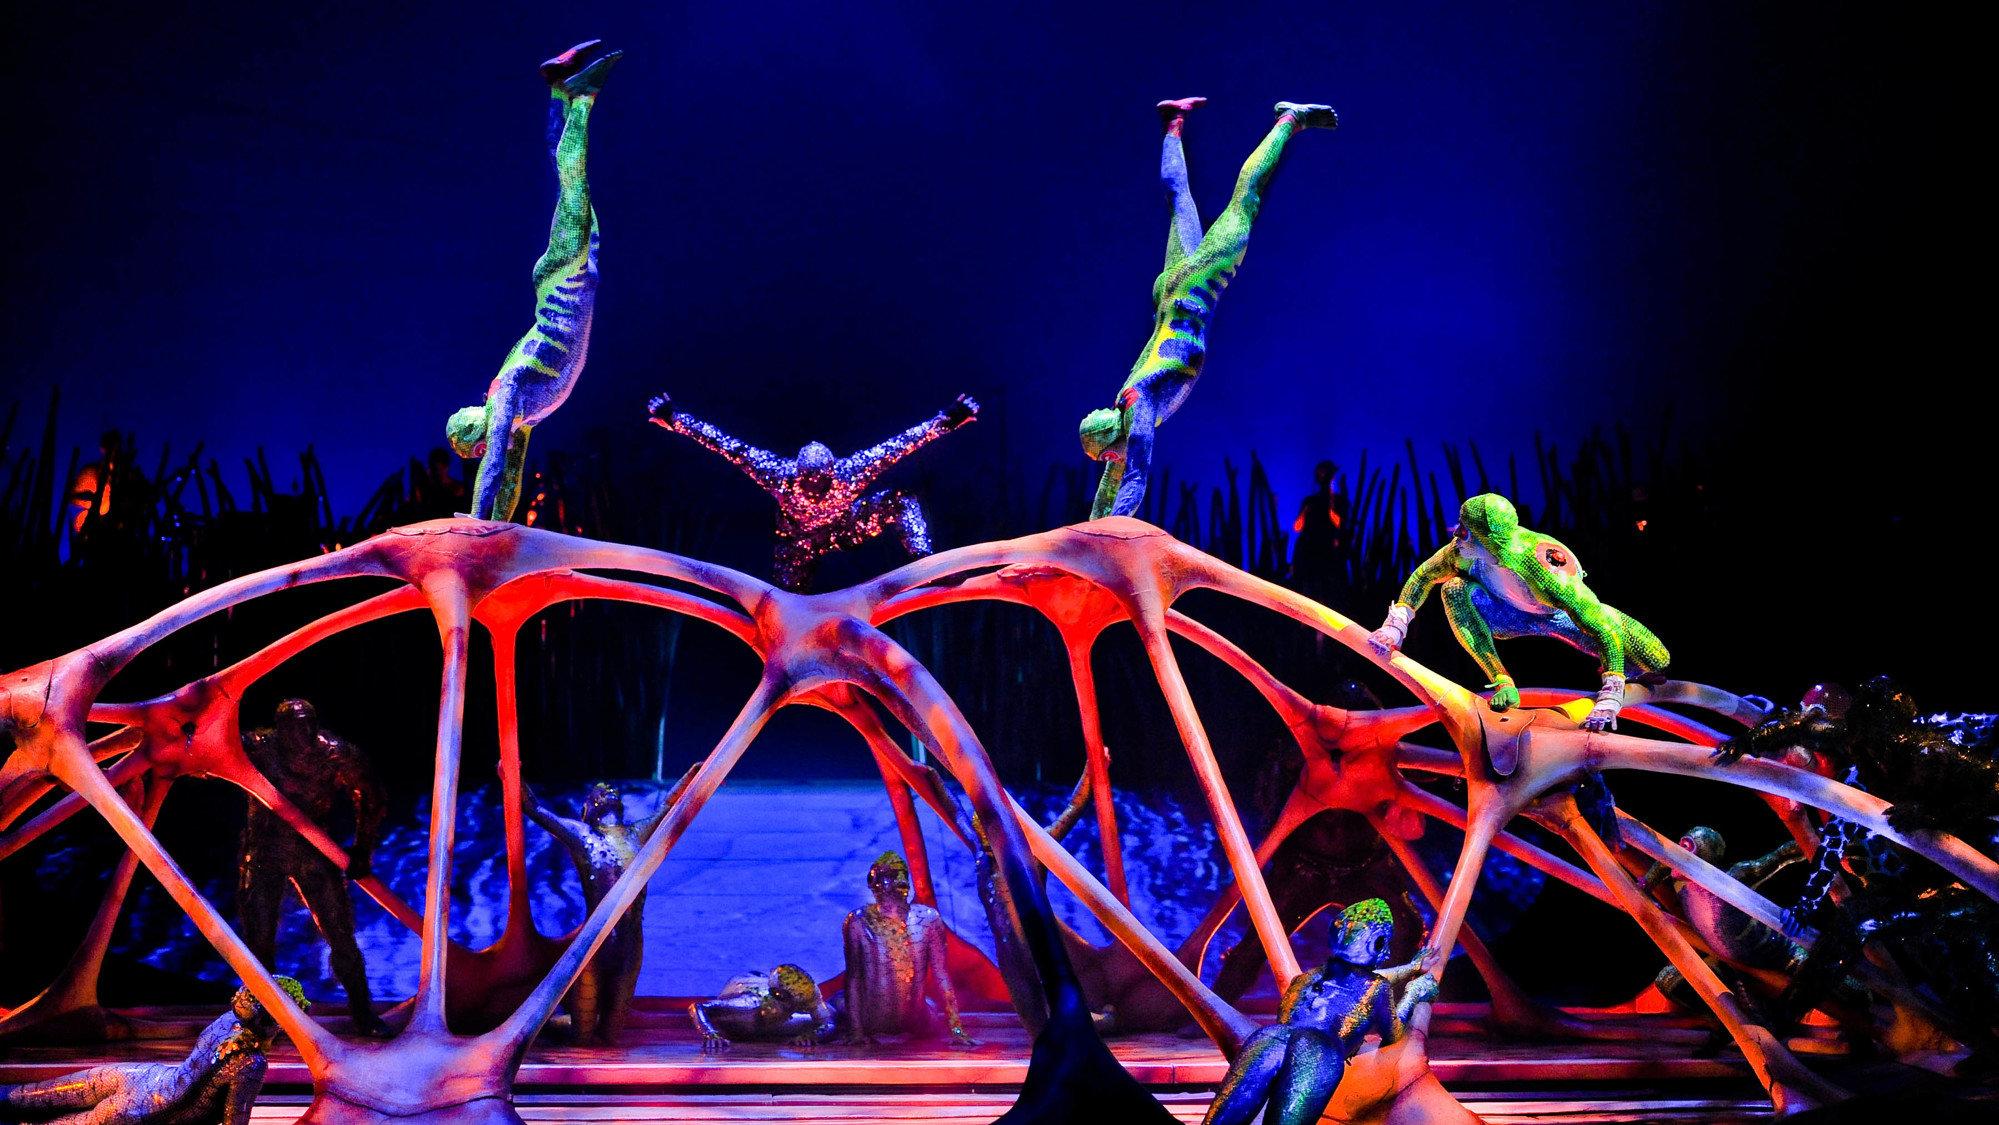 Cirque du Soleil объявил о банкротстве из-за пандемии коронавируса